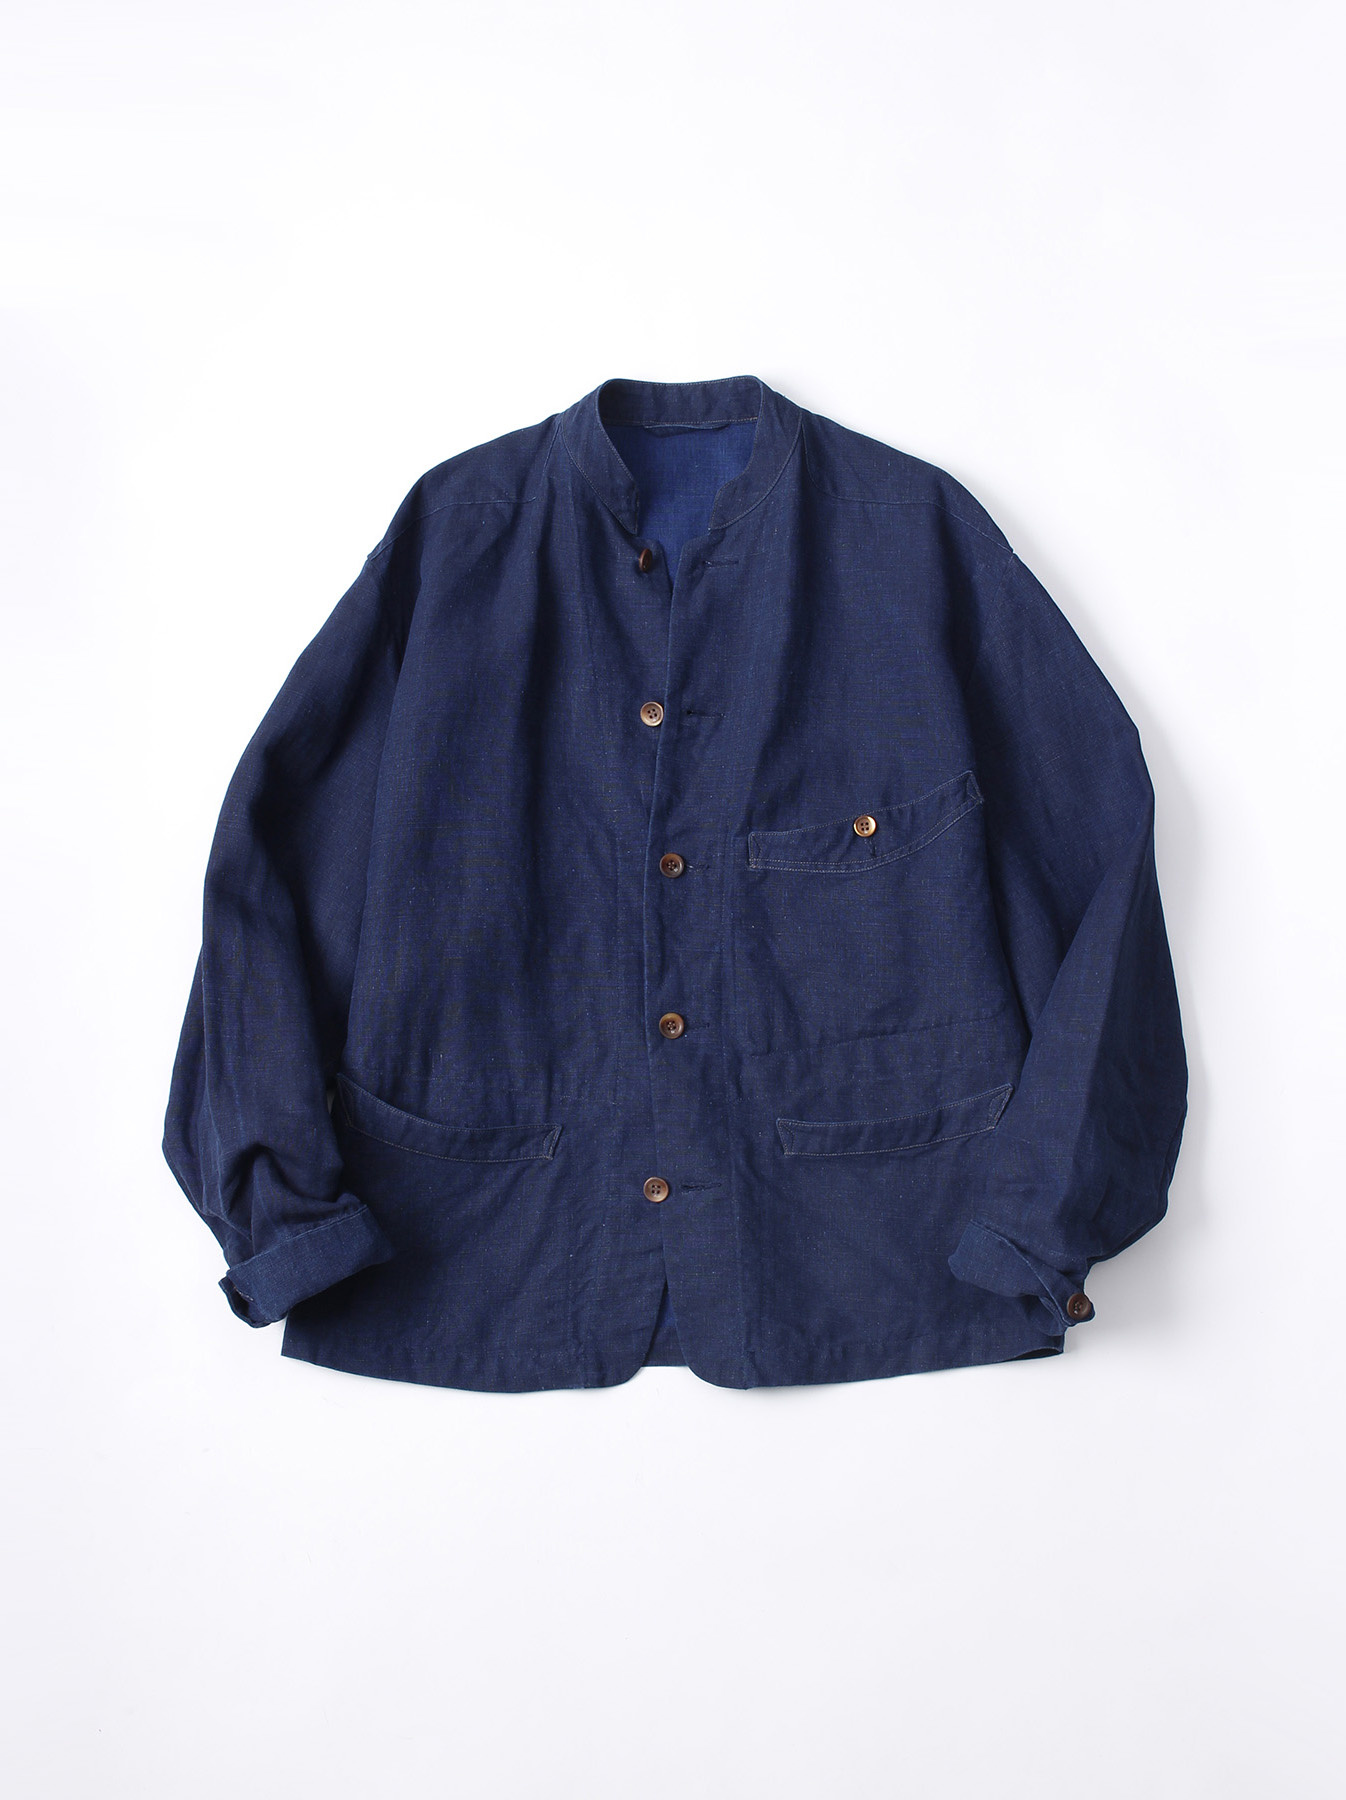 WH Indigo Linen Stand Collar Jacket-1